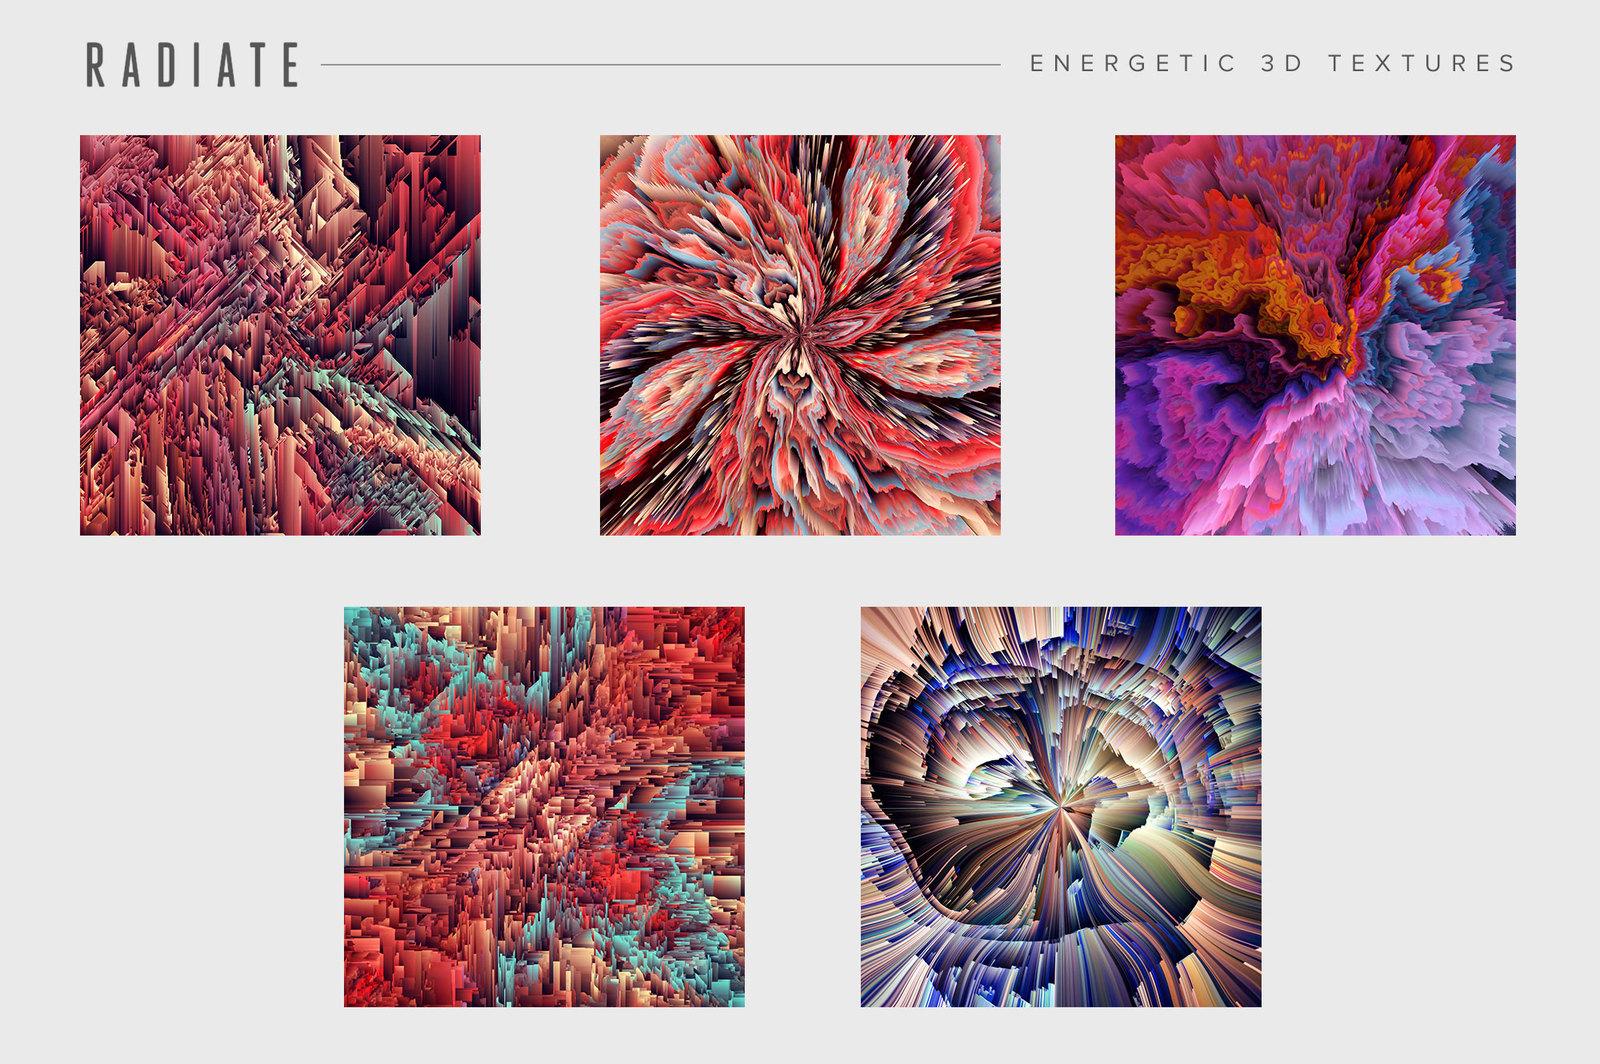 Radiate: Energetic 3D Textures